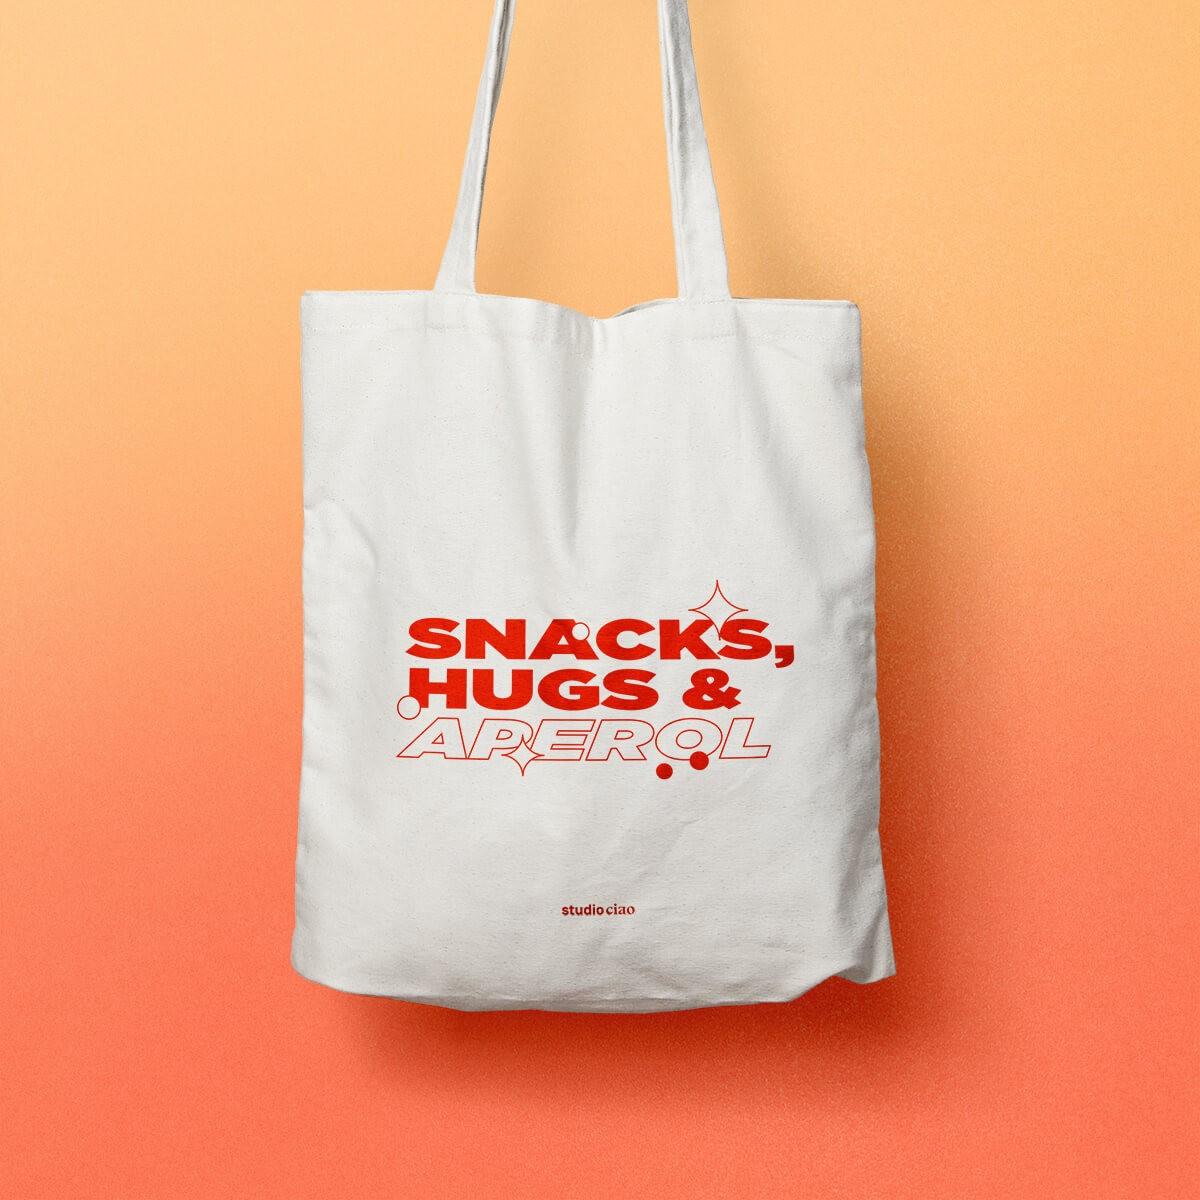 Snacks, Hugs & Aperol Jutebeutel – studio ciao